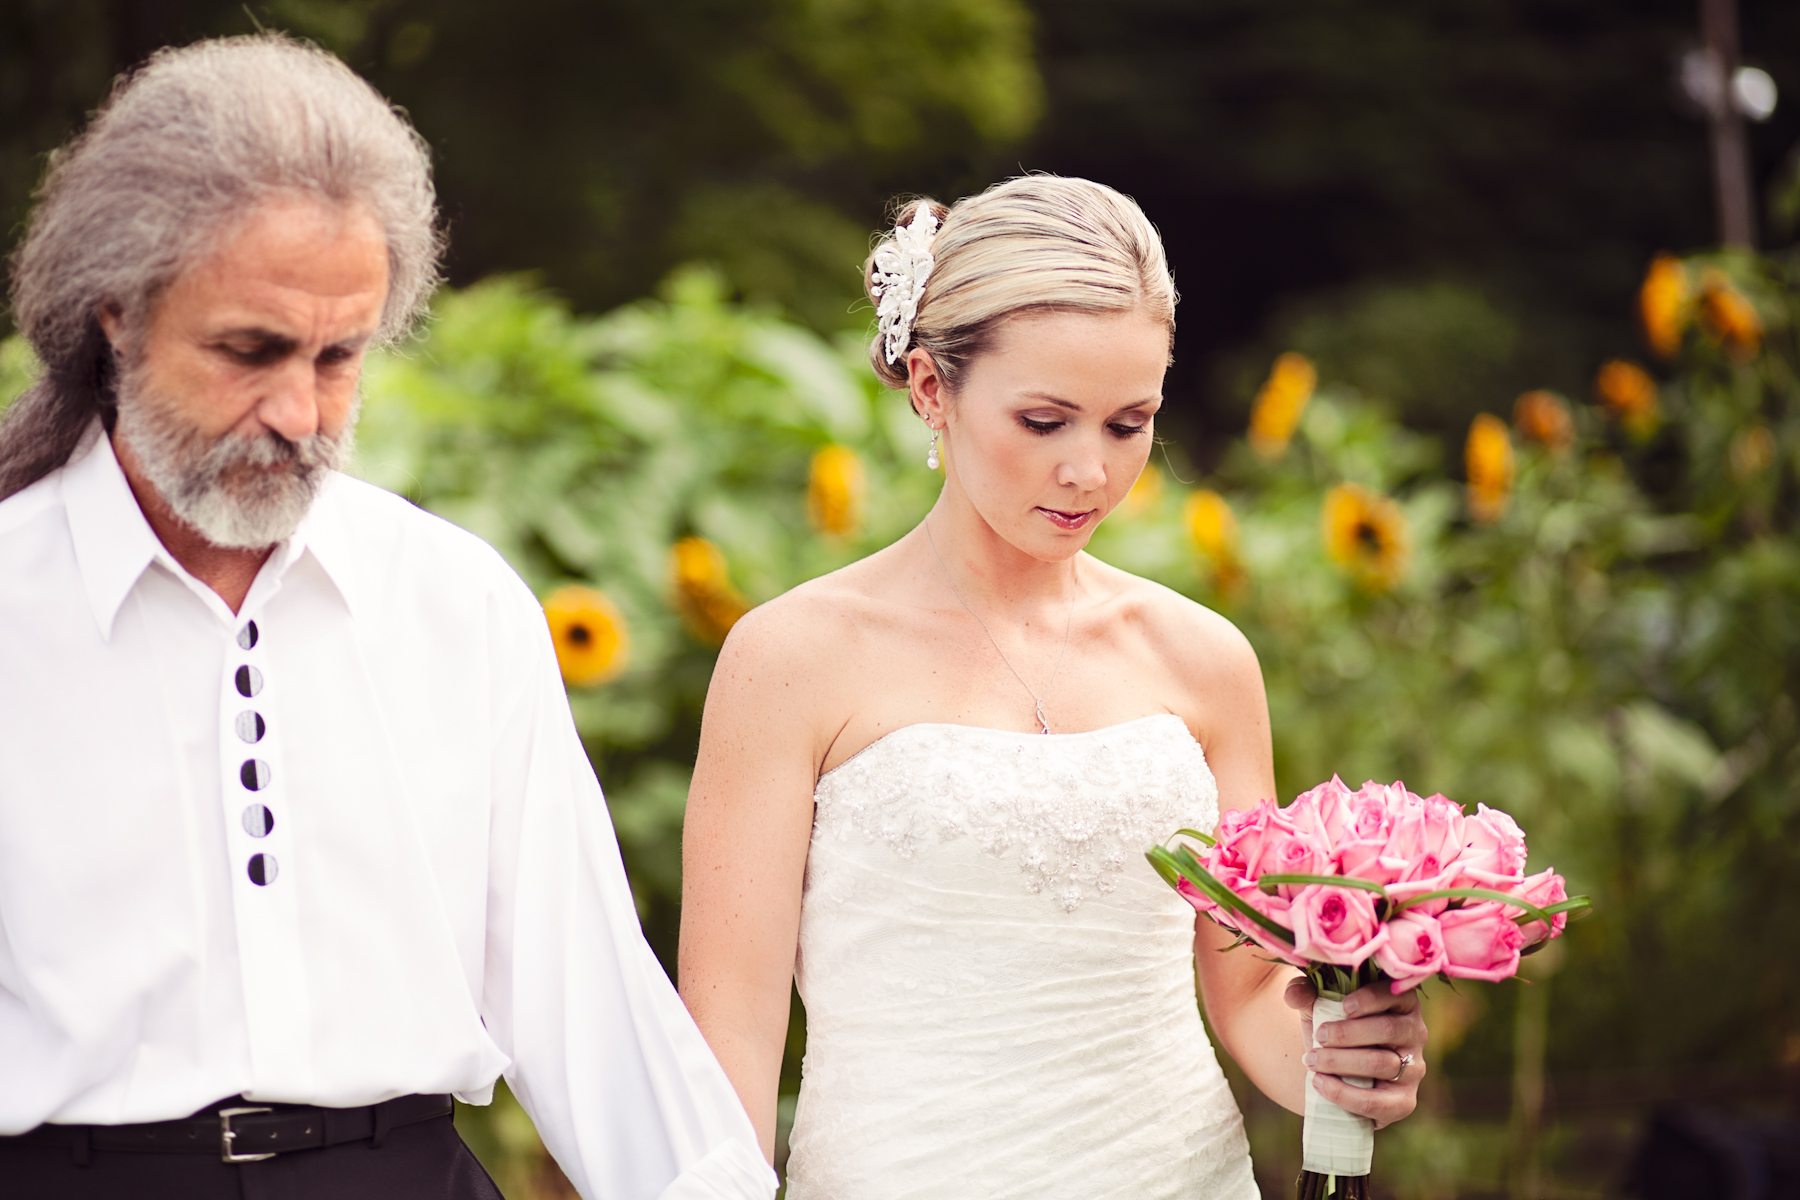 High Country Wedding Photographer Revival Photography at The mast Farm Inn